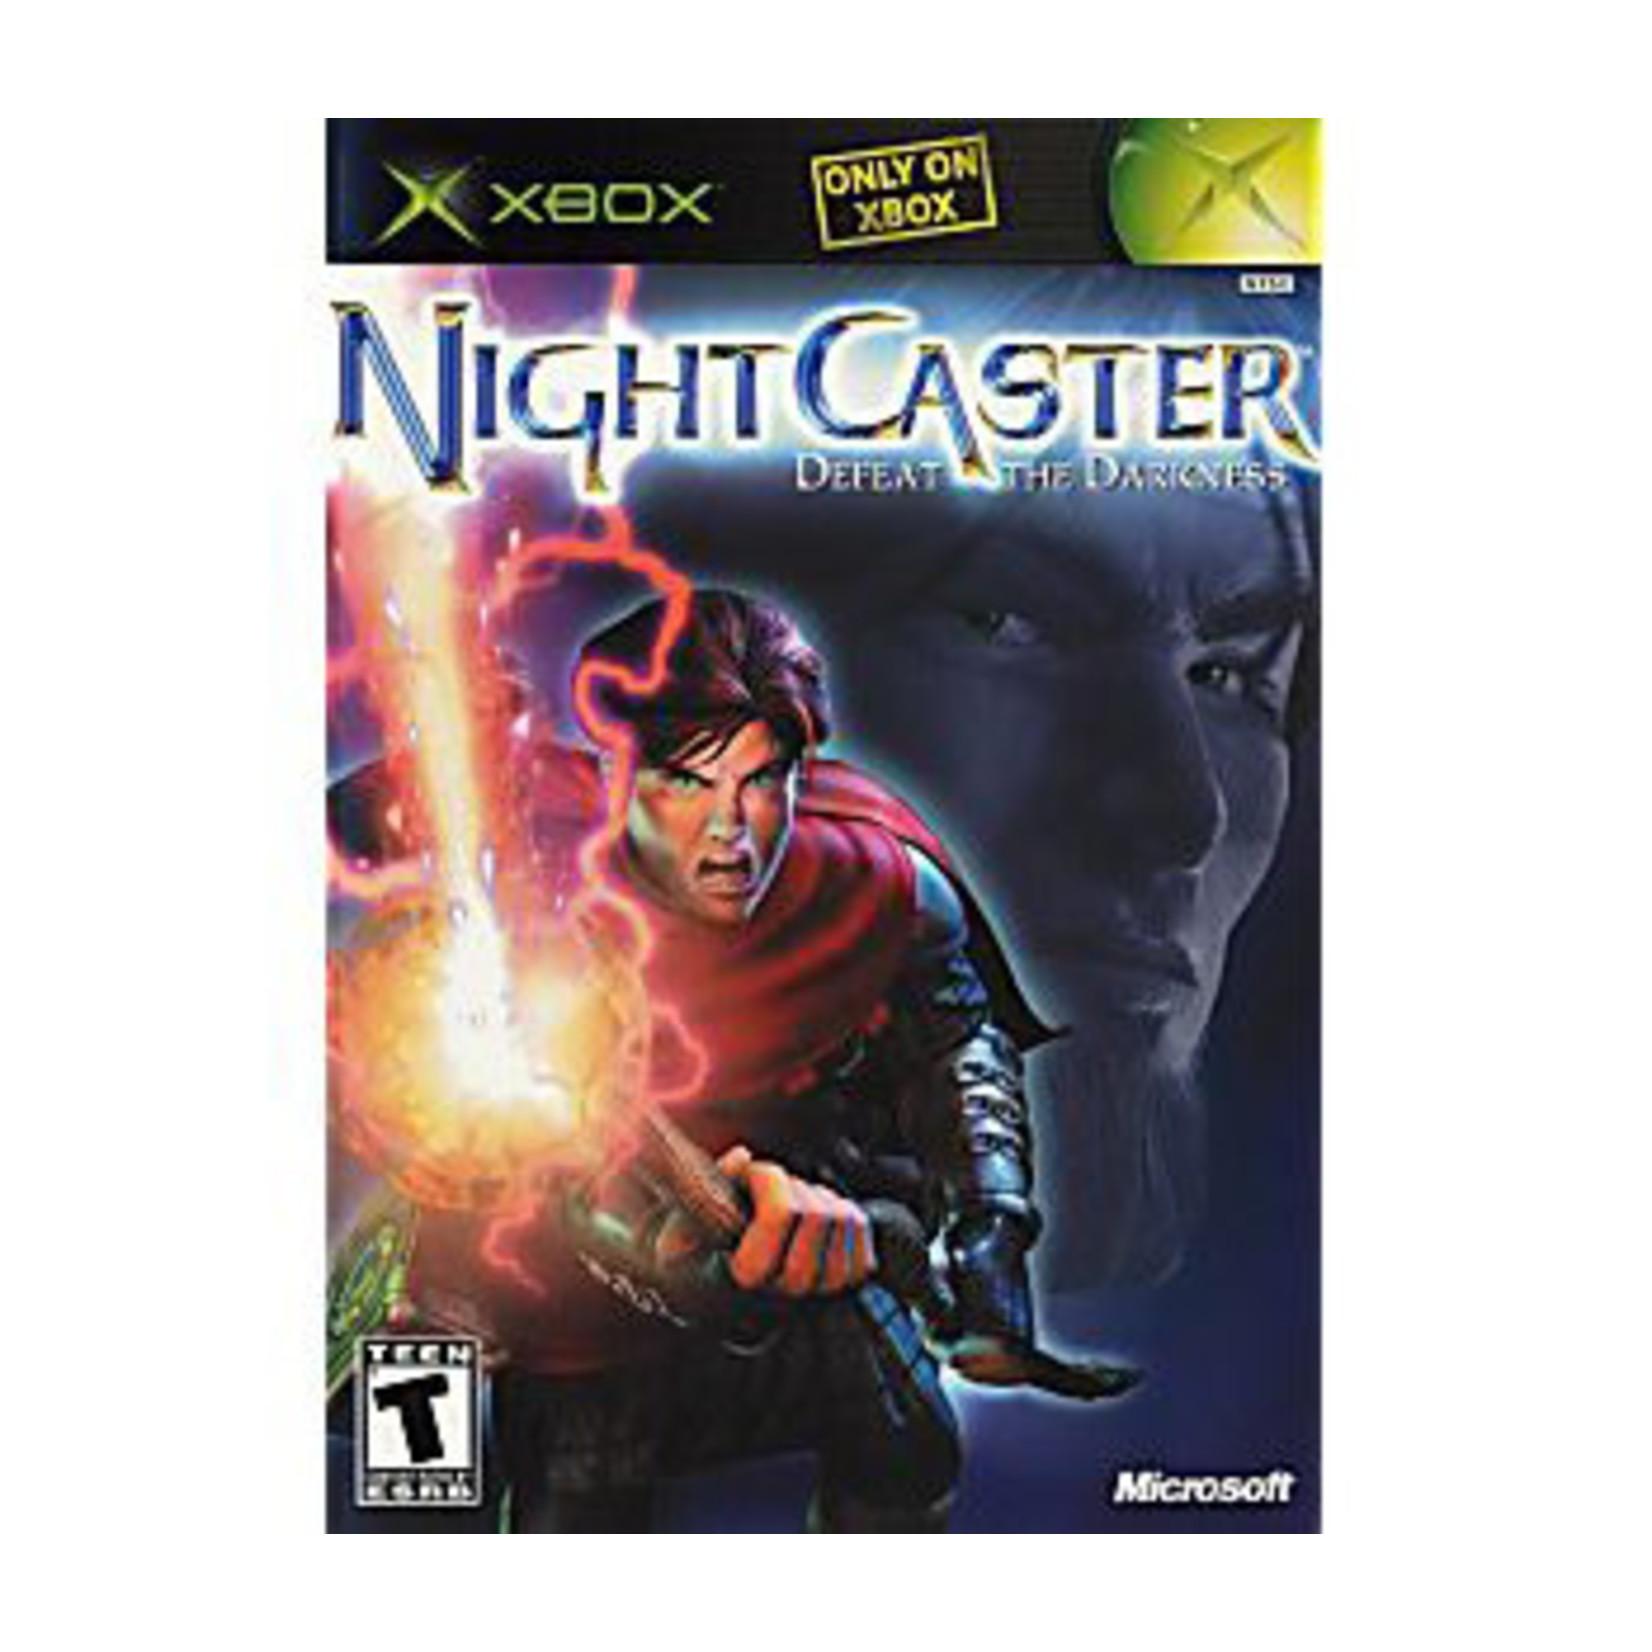 XBU-NIGHT CASTER DEFEAT THE DARKNESS